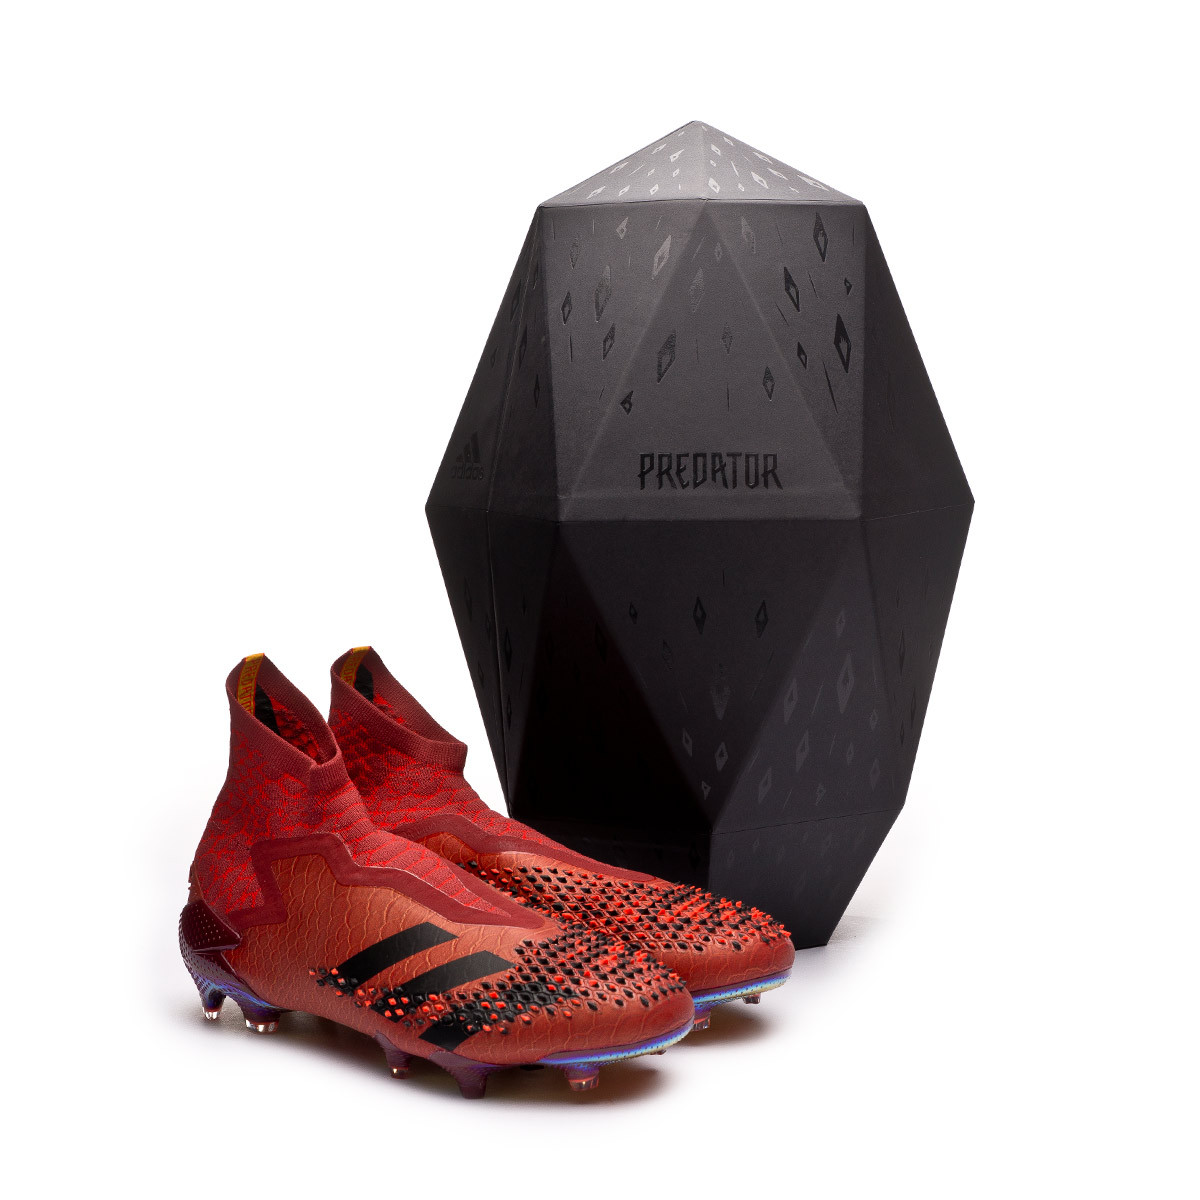 réplica arpón pérdida  Football Boots adidas Predator 20+ FG Animalistic Collegiate burgundy-Core  black-Solar red - Football store Fútbol Emotion